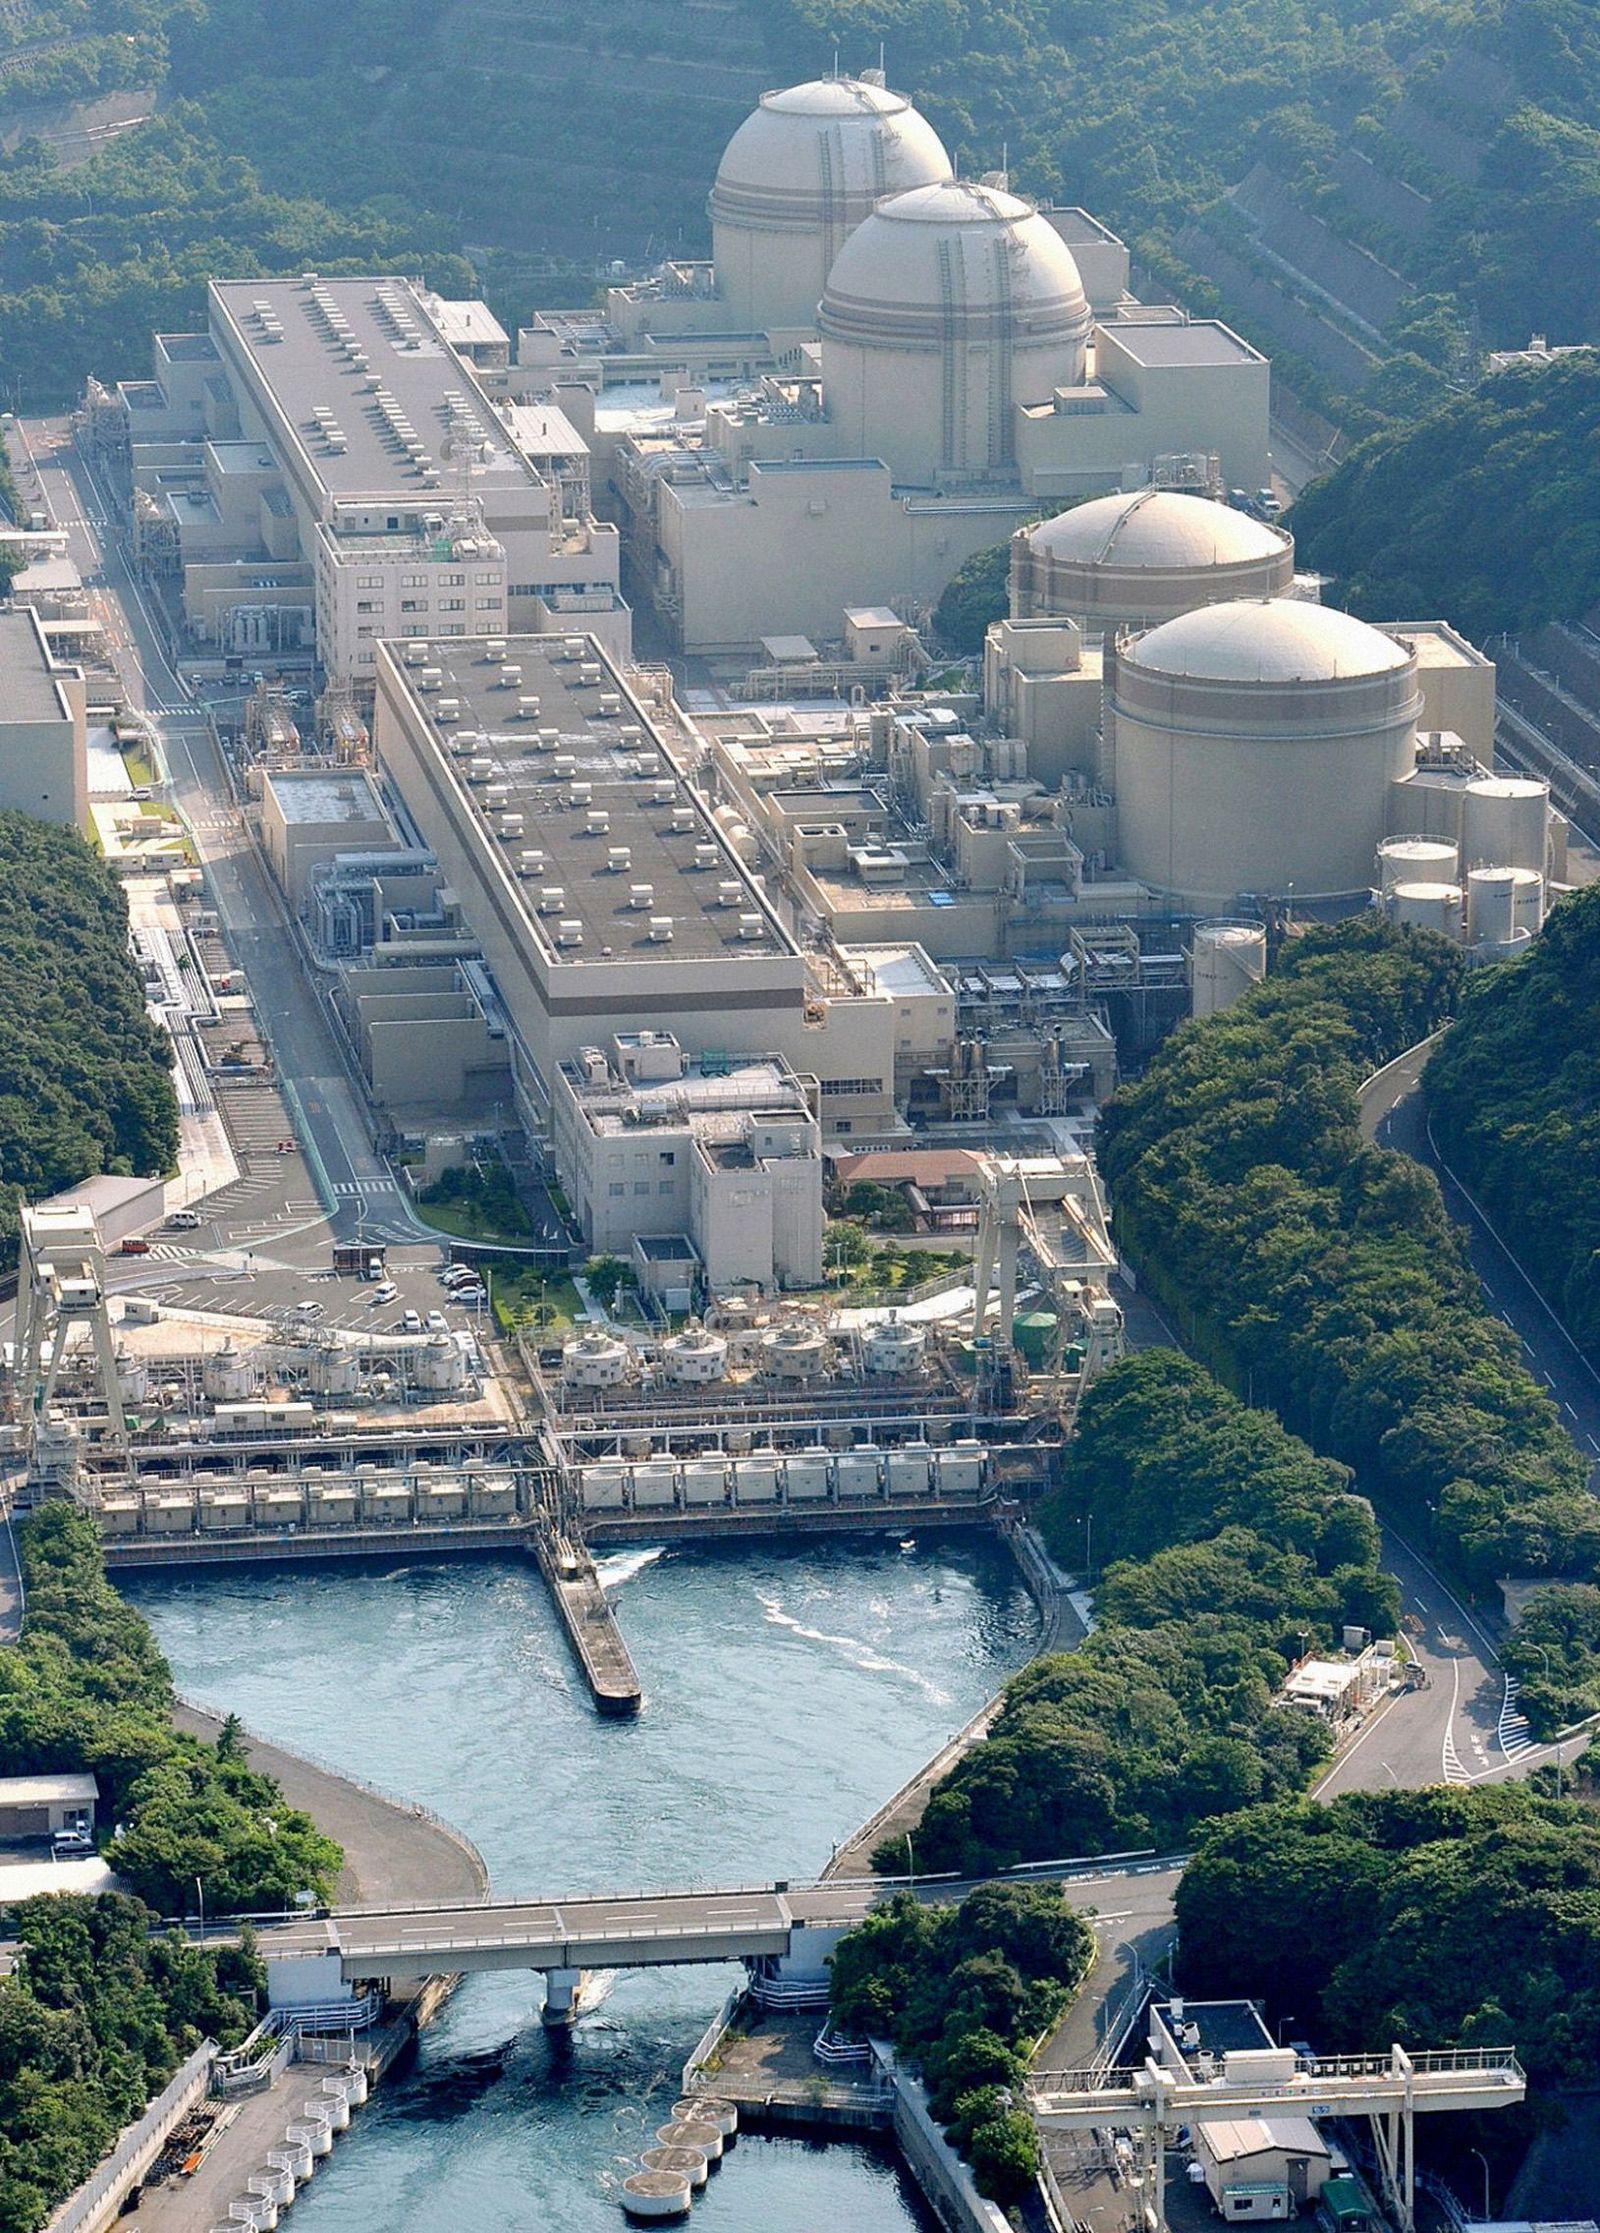 Japan / Atomkraftwerk / Ohi